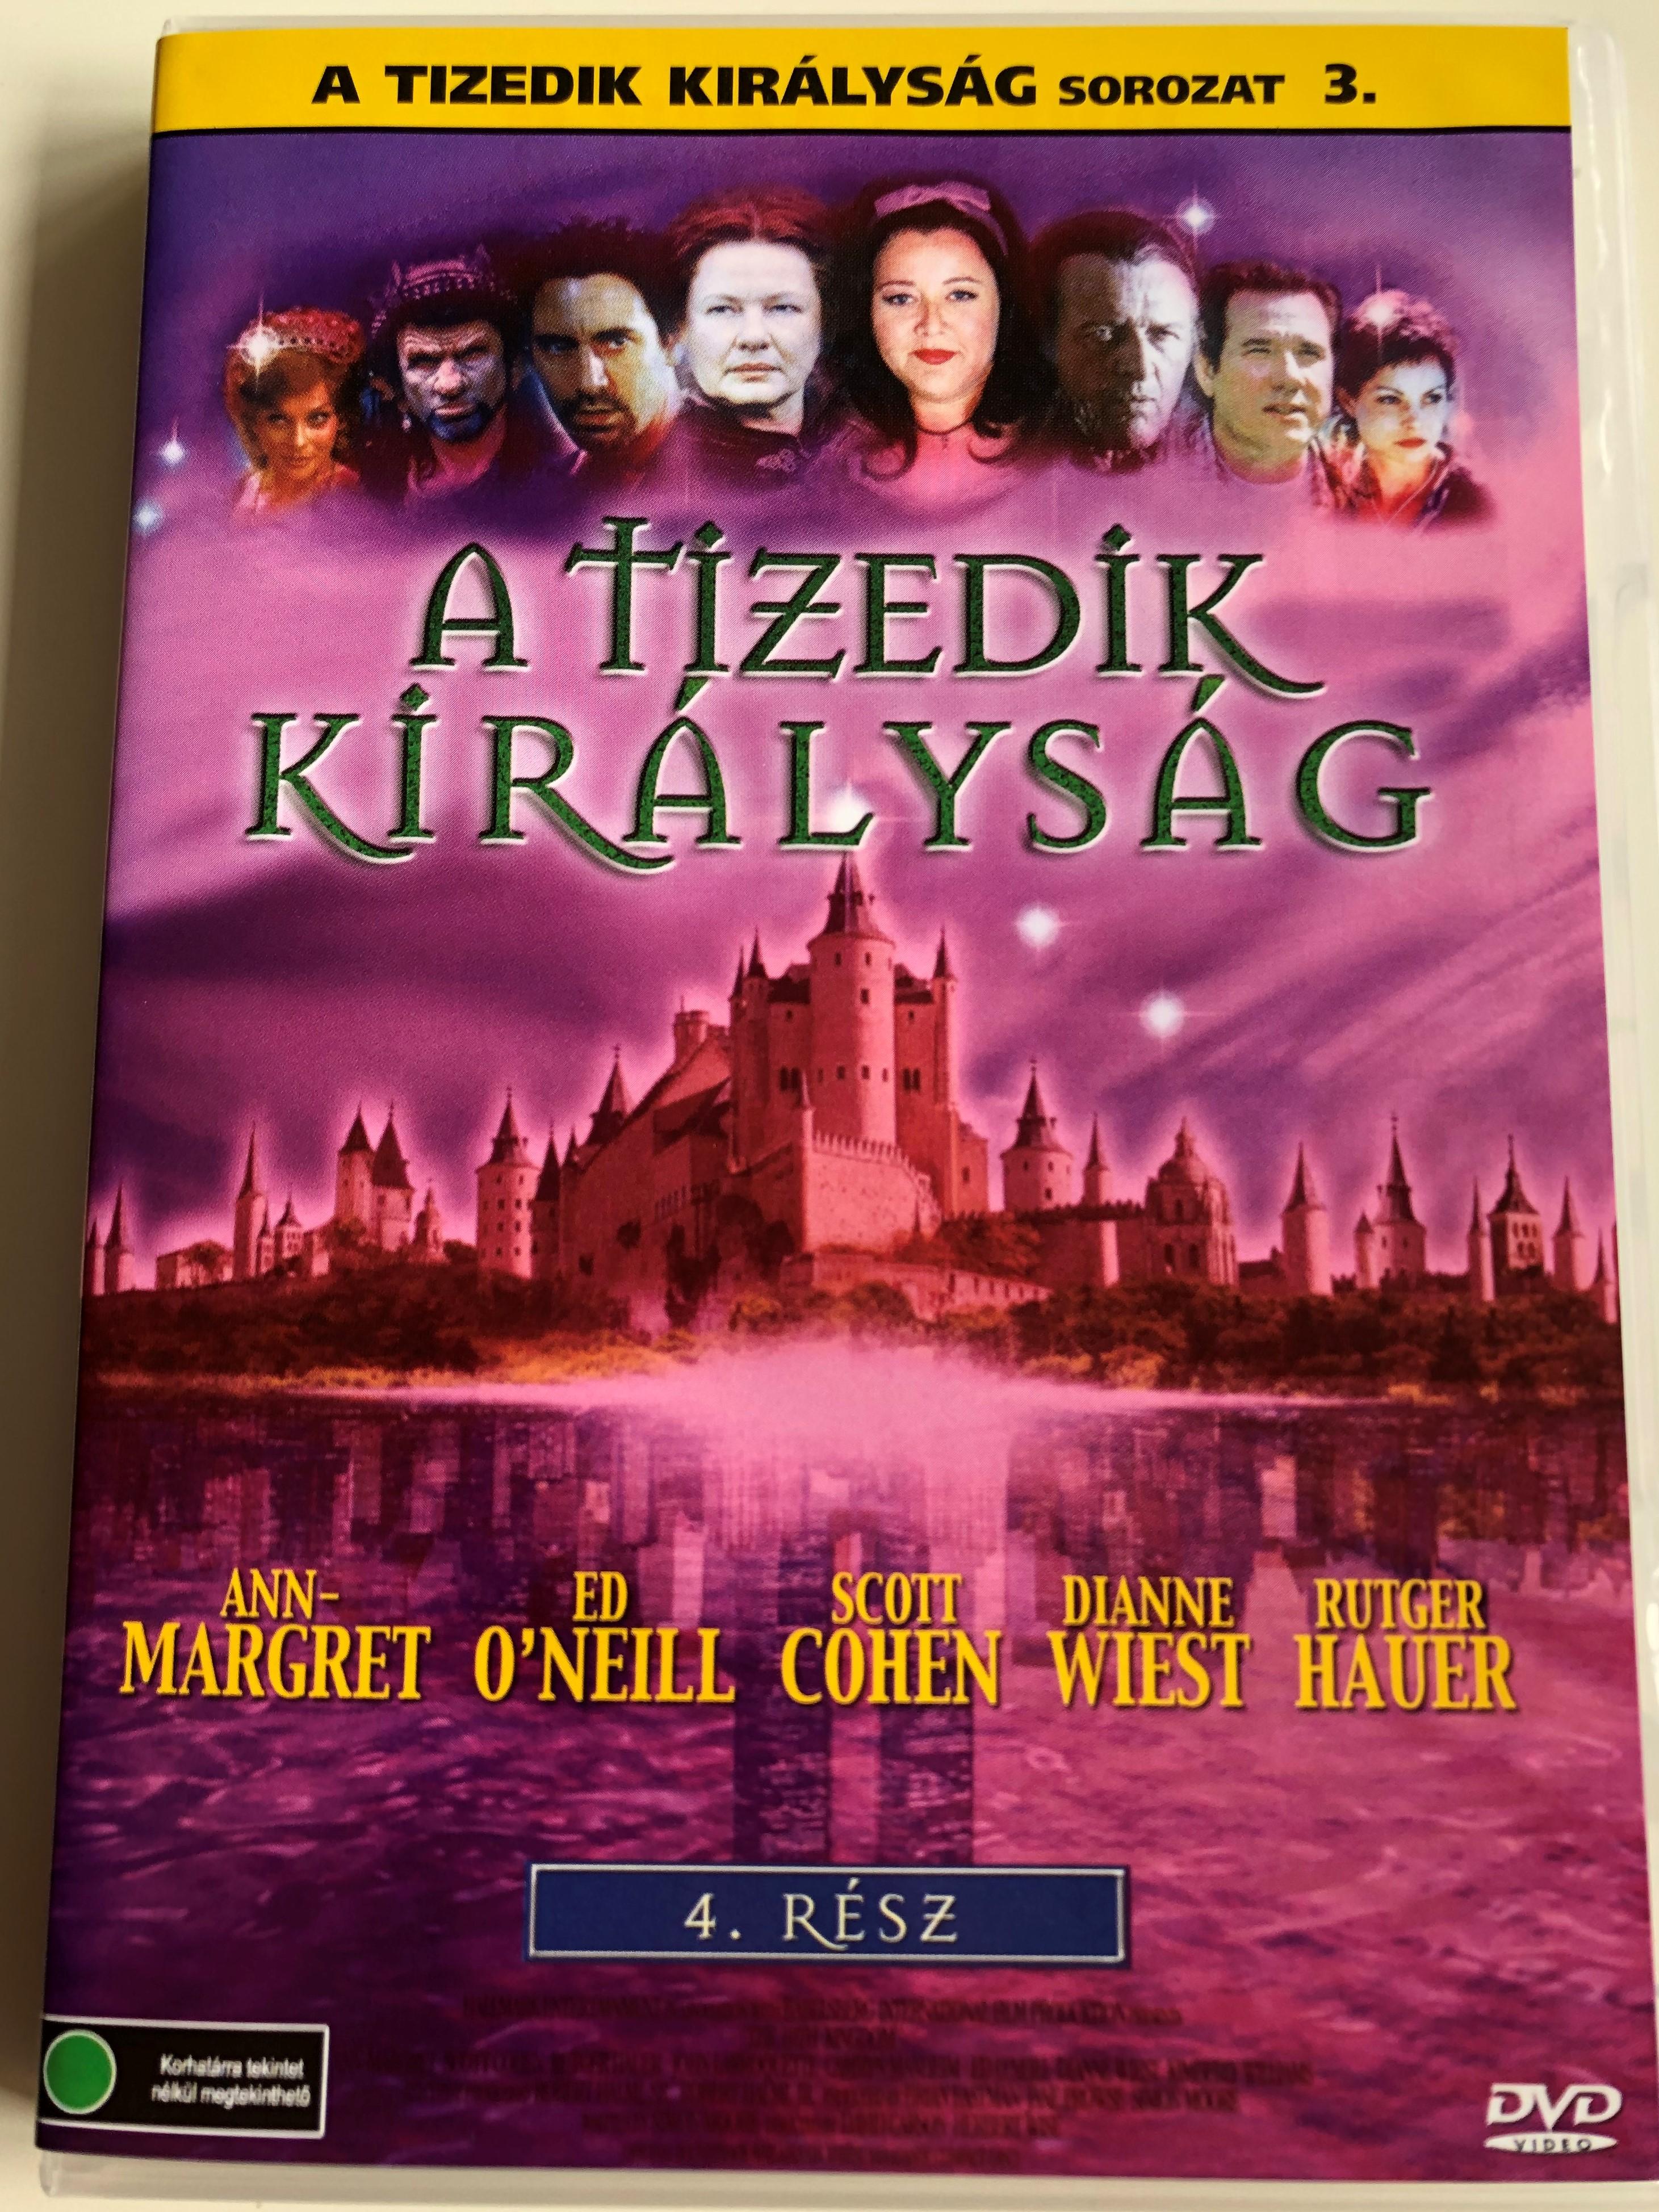 a-tizedik-kir-lys-g-4.-dvd-2000-the-10th-kingdom-part-4-directed-by-david-carson-herbert-wise-starring-ann-margret-ed-o-neill-scott-cohen-dianne-wiest-rutger-hauer-1-.jpg